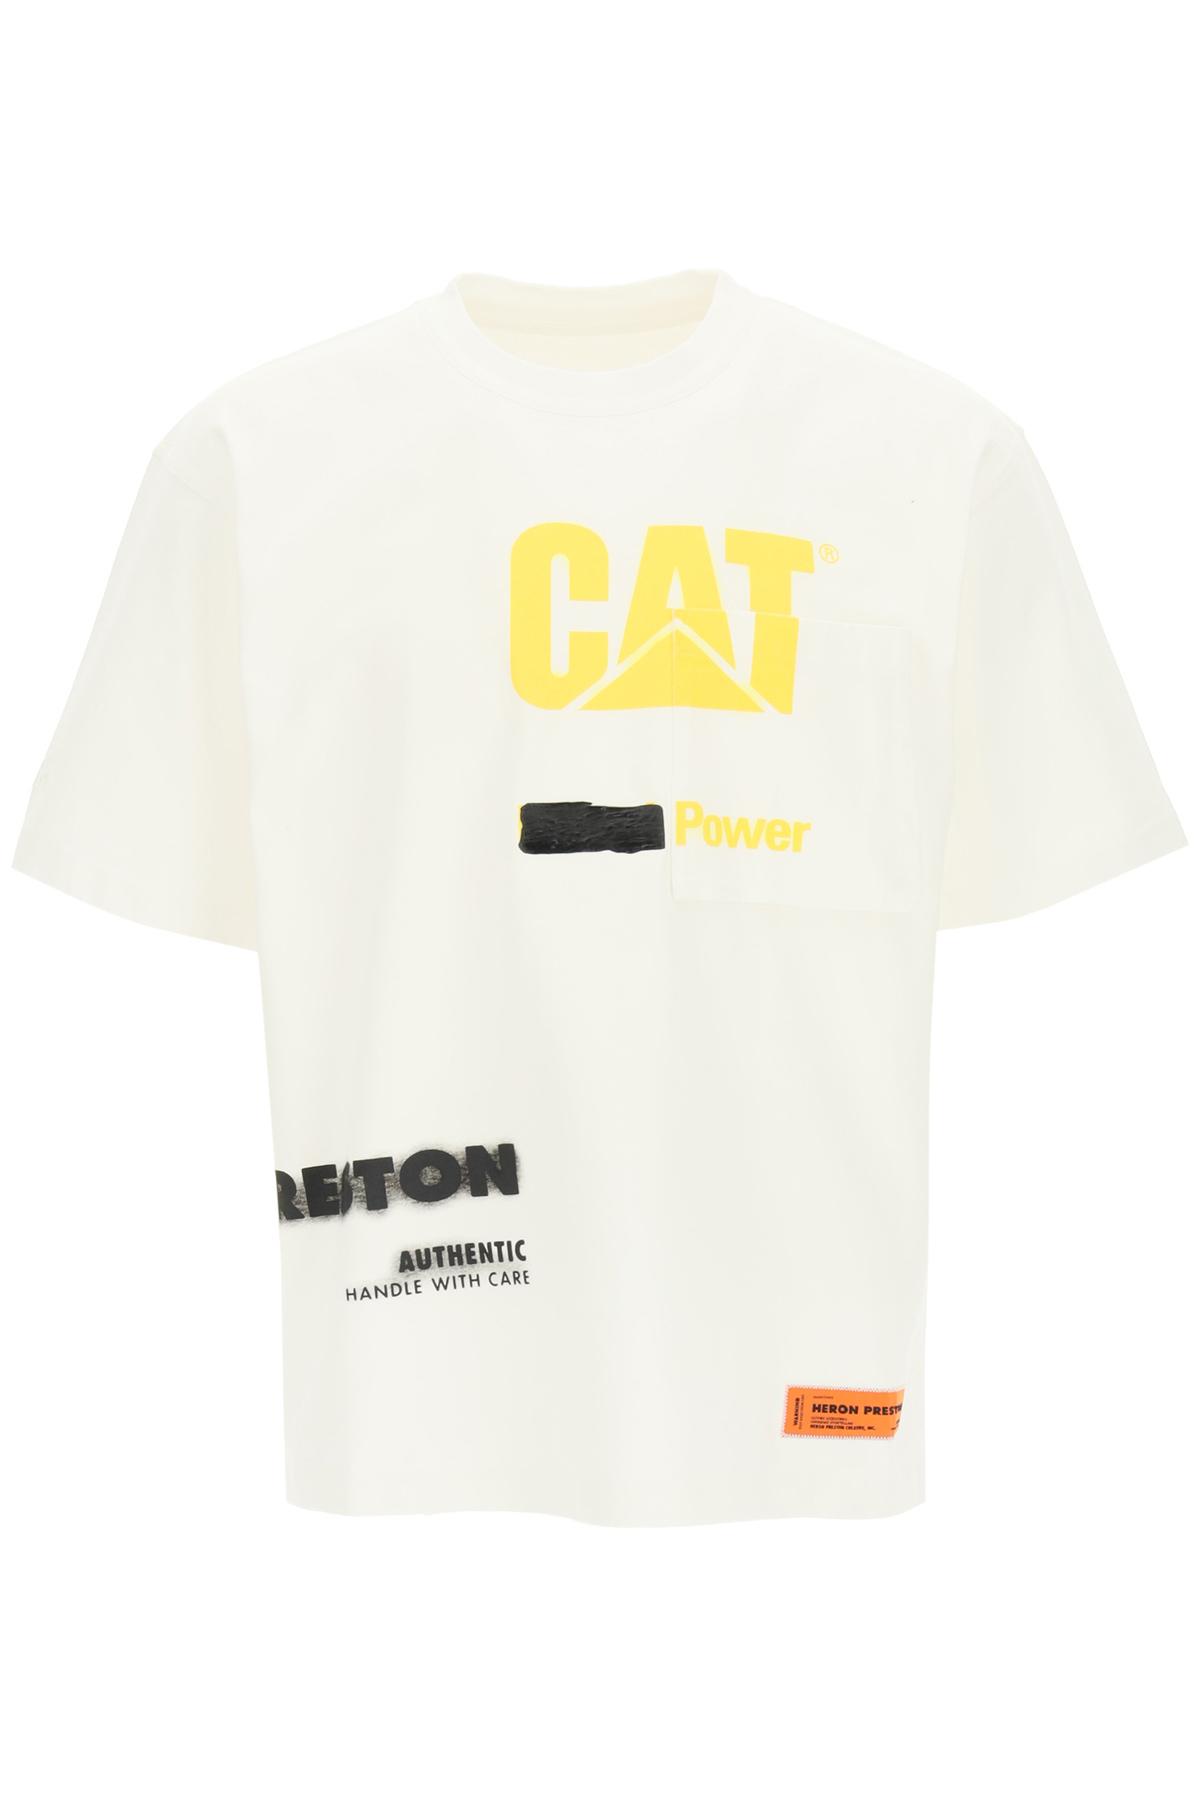 Heron preston t-shirt hp x caterpillar